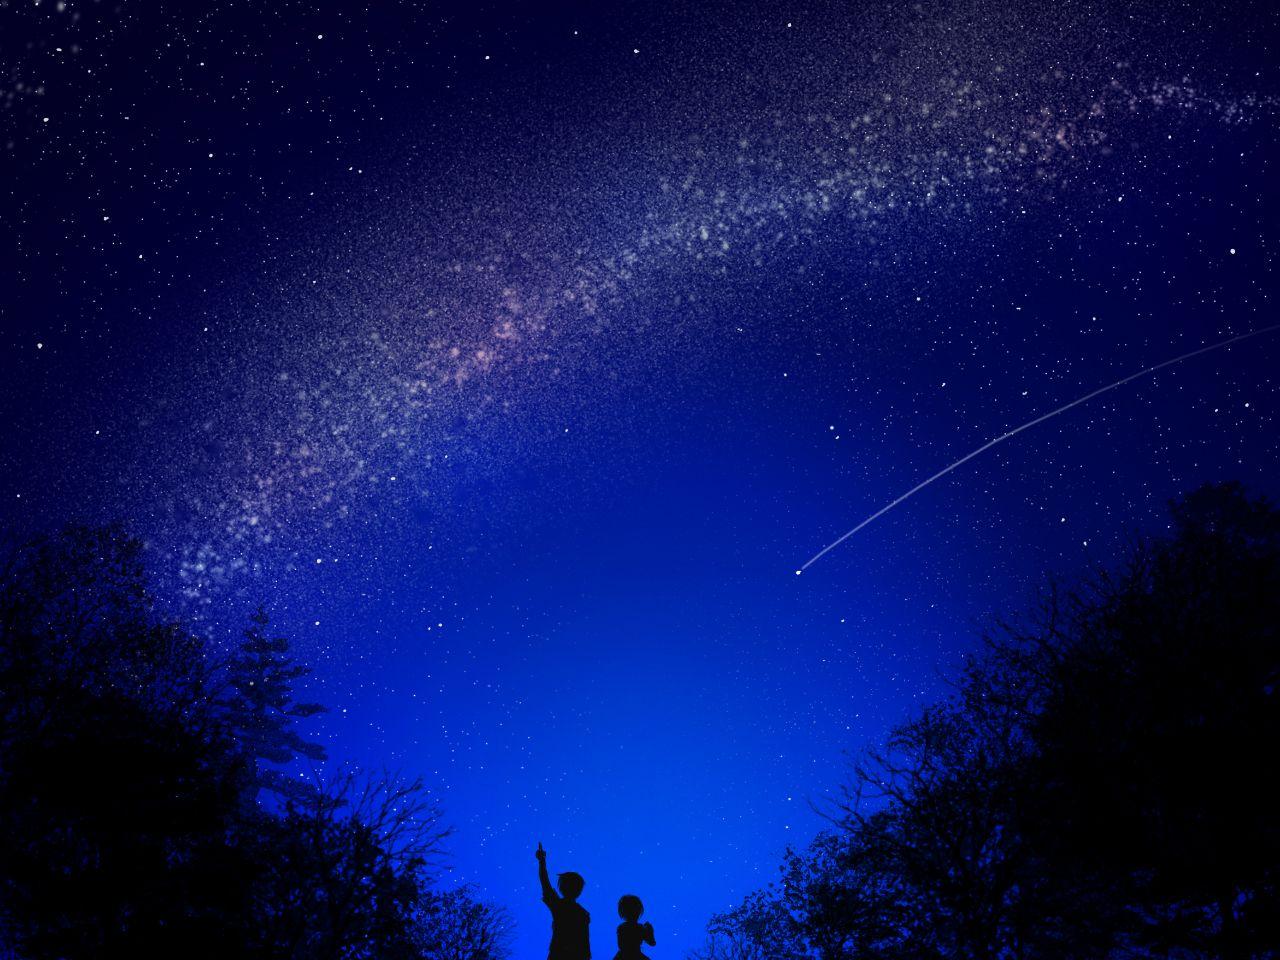 The Night Sky - Google Search